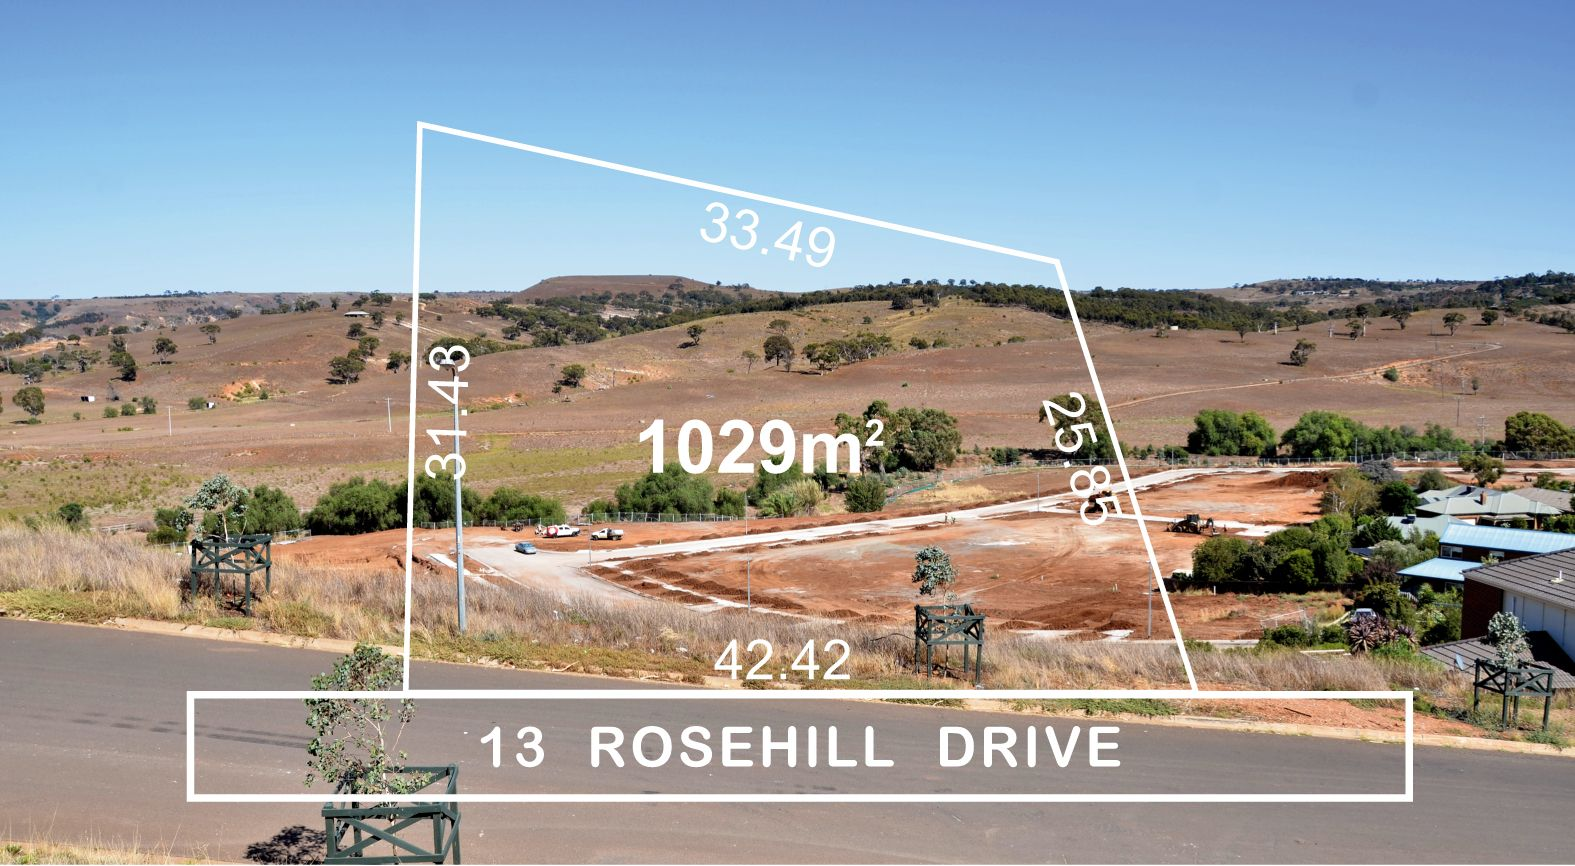 13 Rosehill Drive, Bacchus Marsh VIC 3340, Image 0